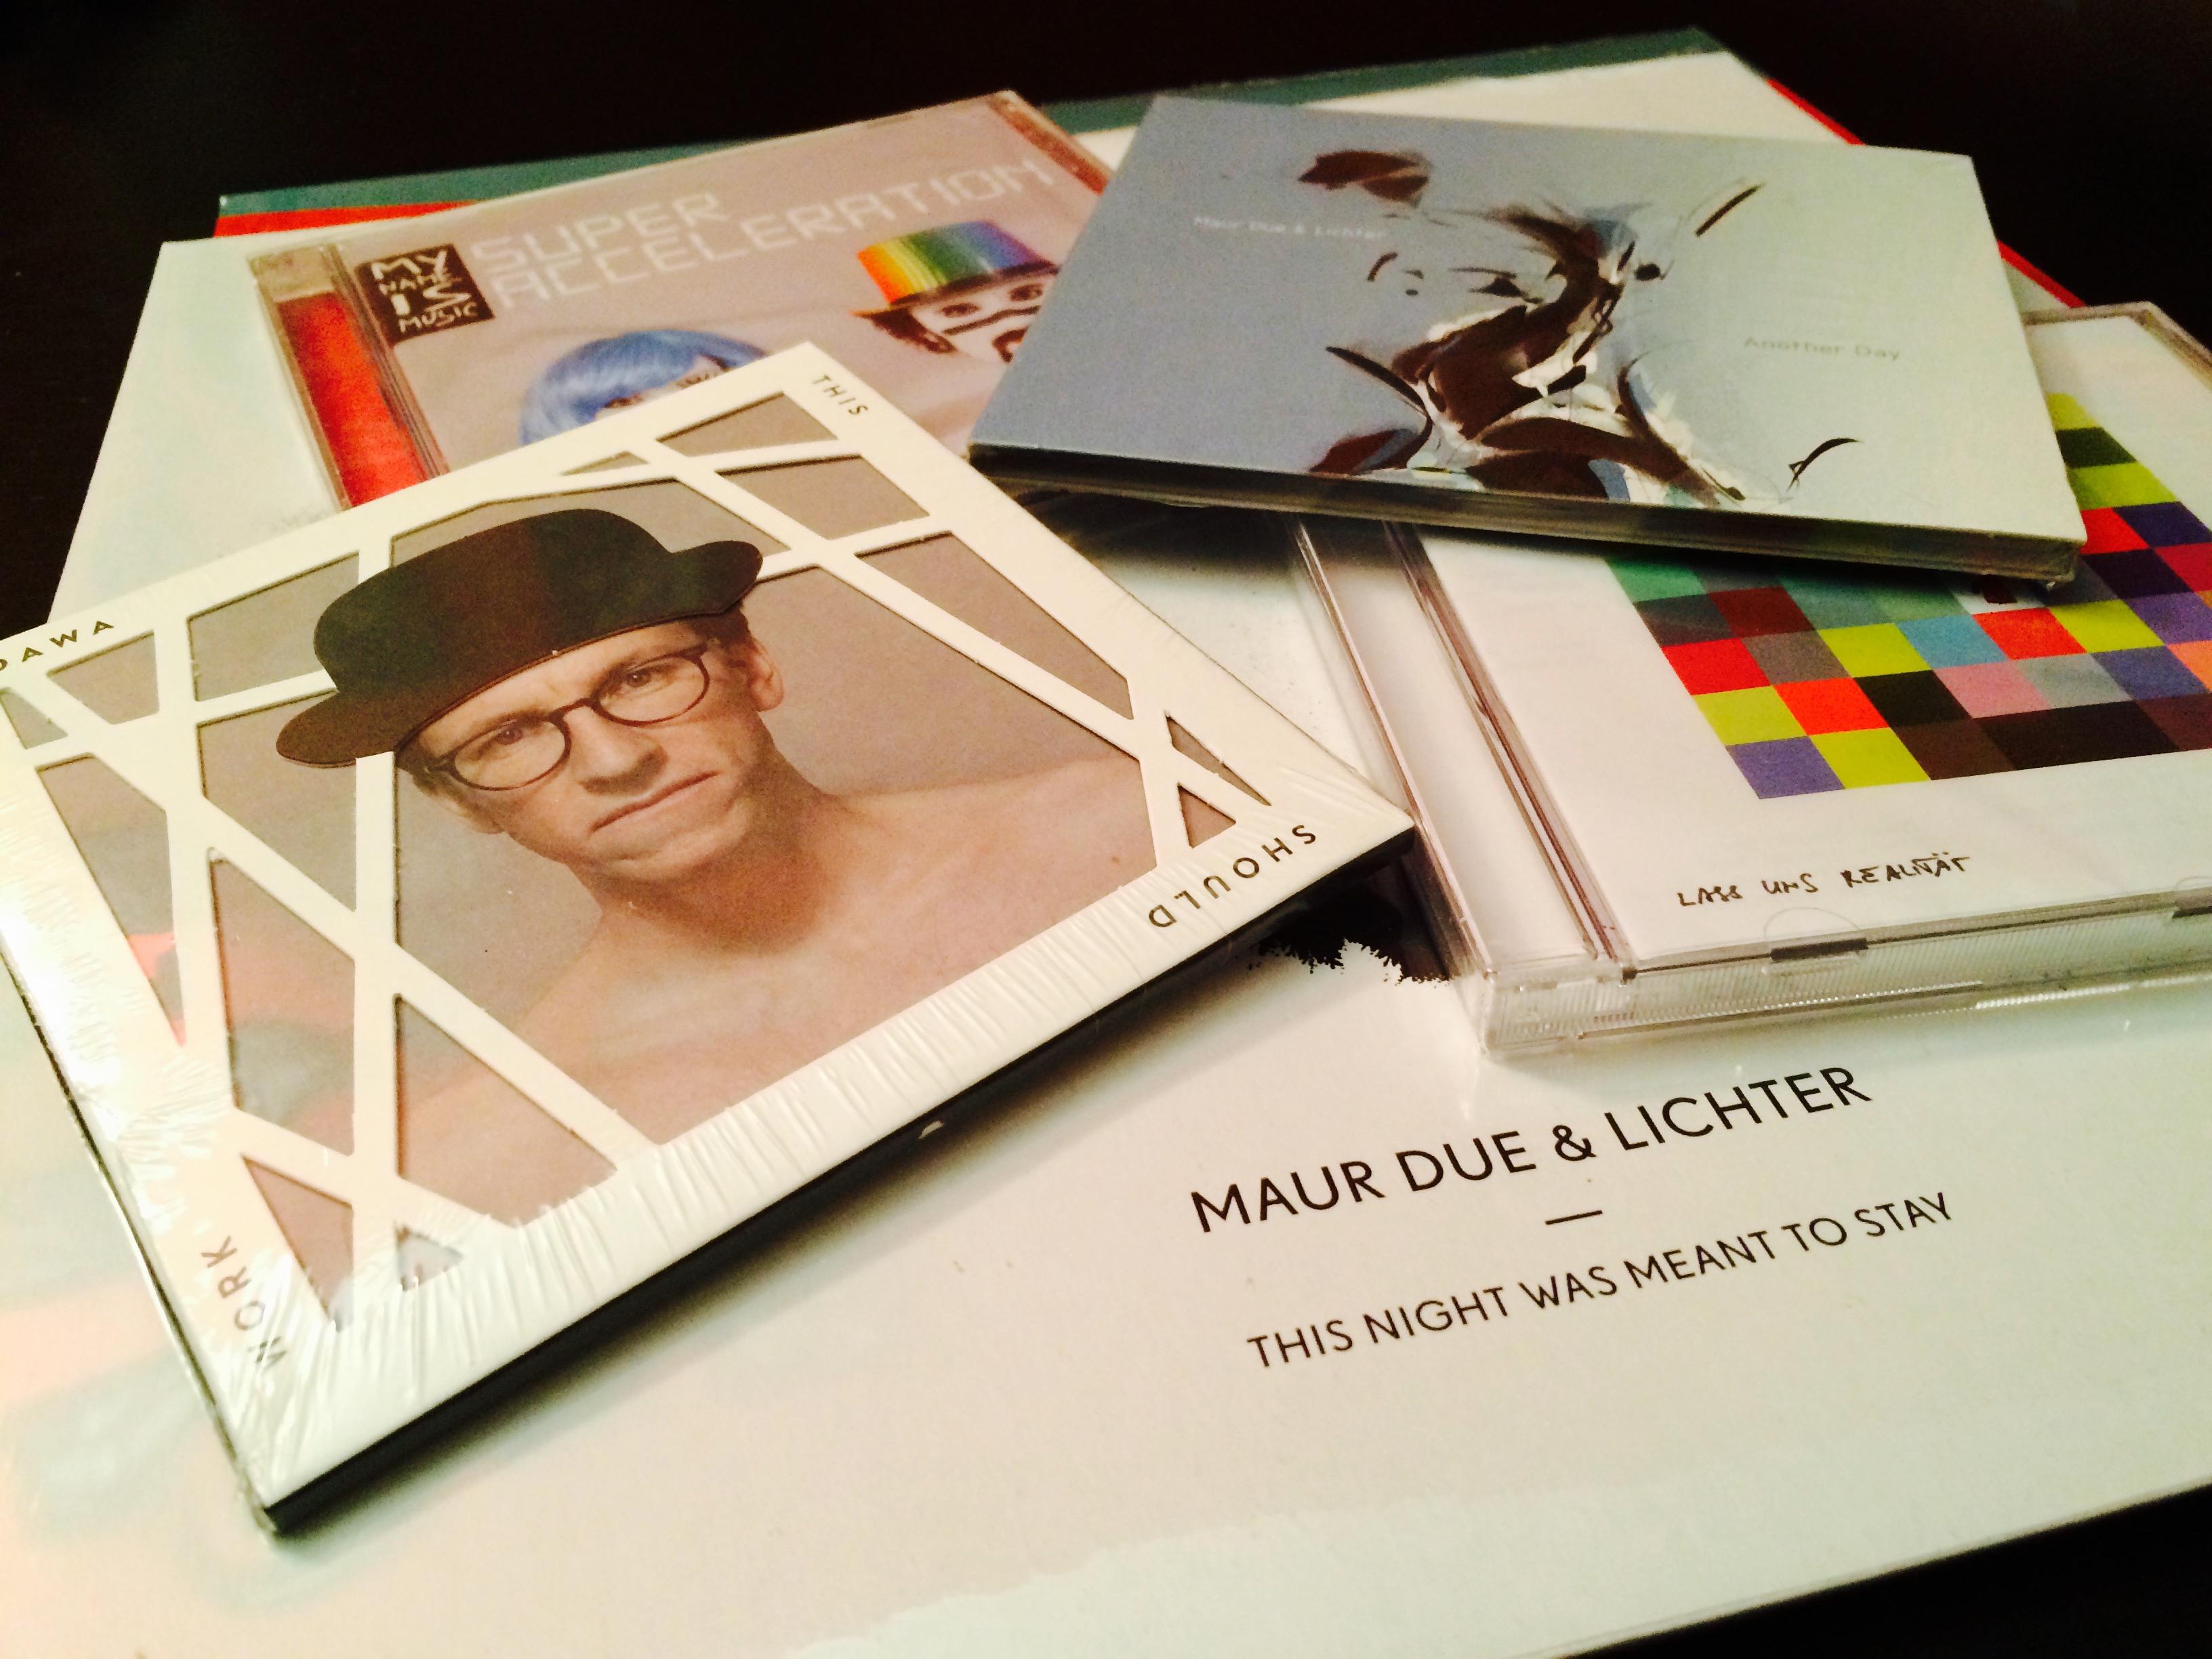 LasVegas Records Goodie Pack